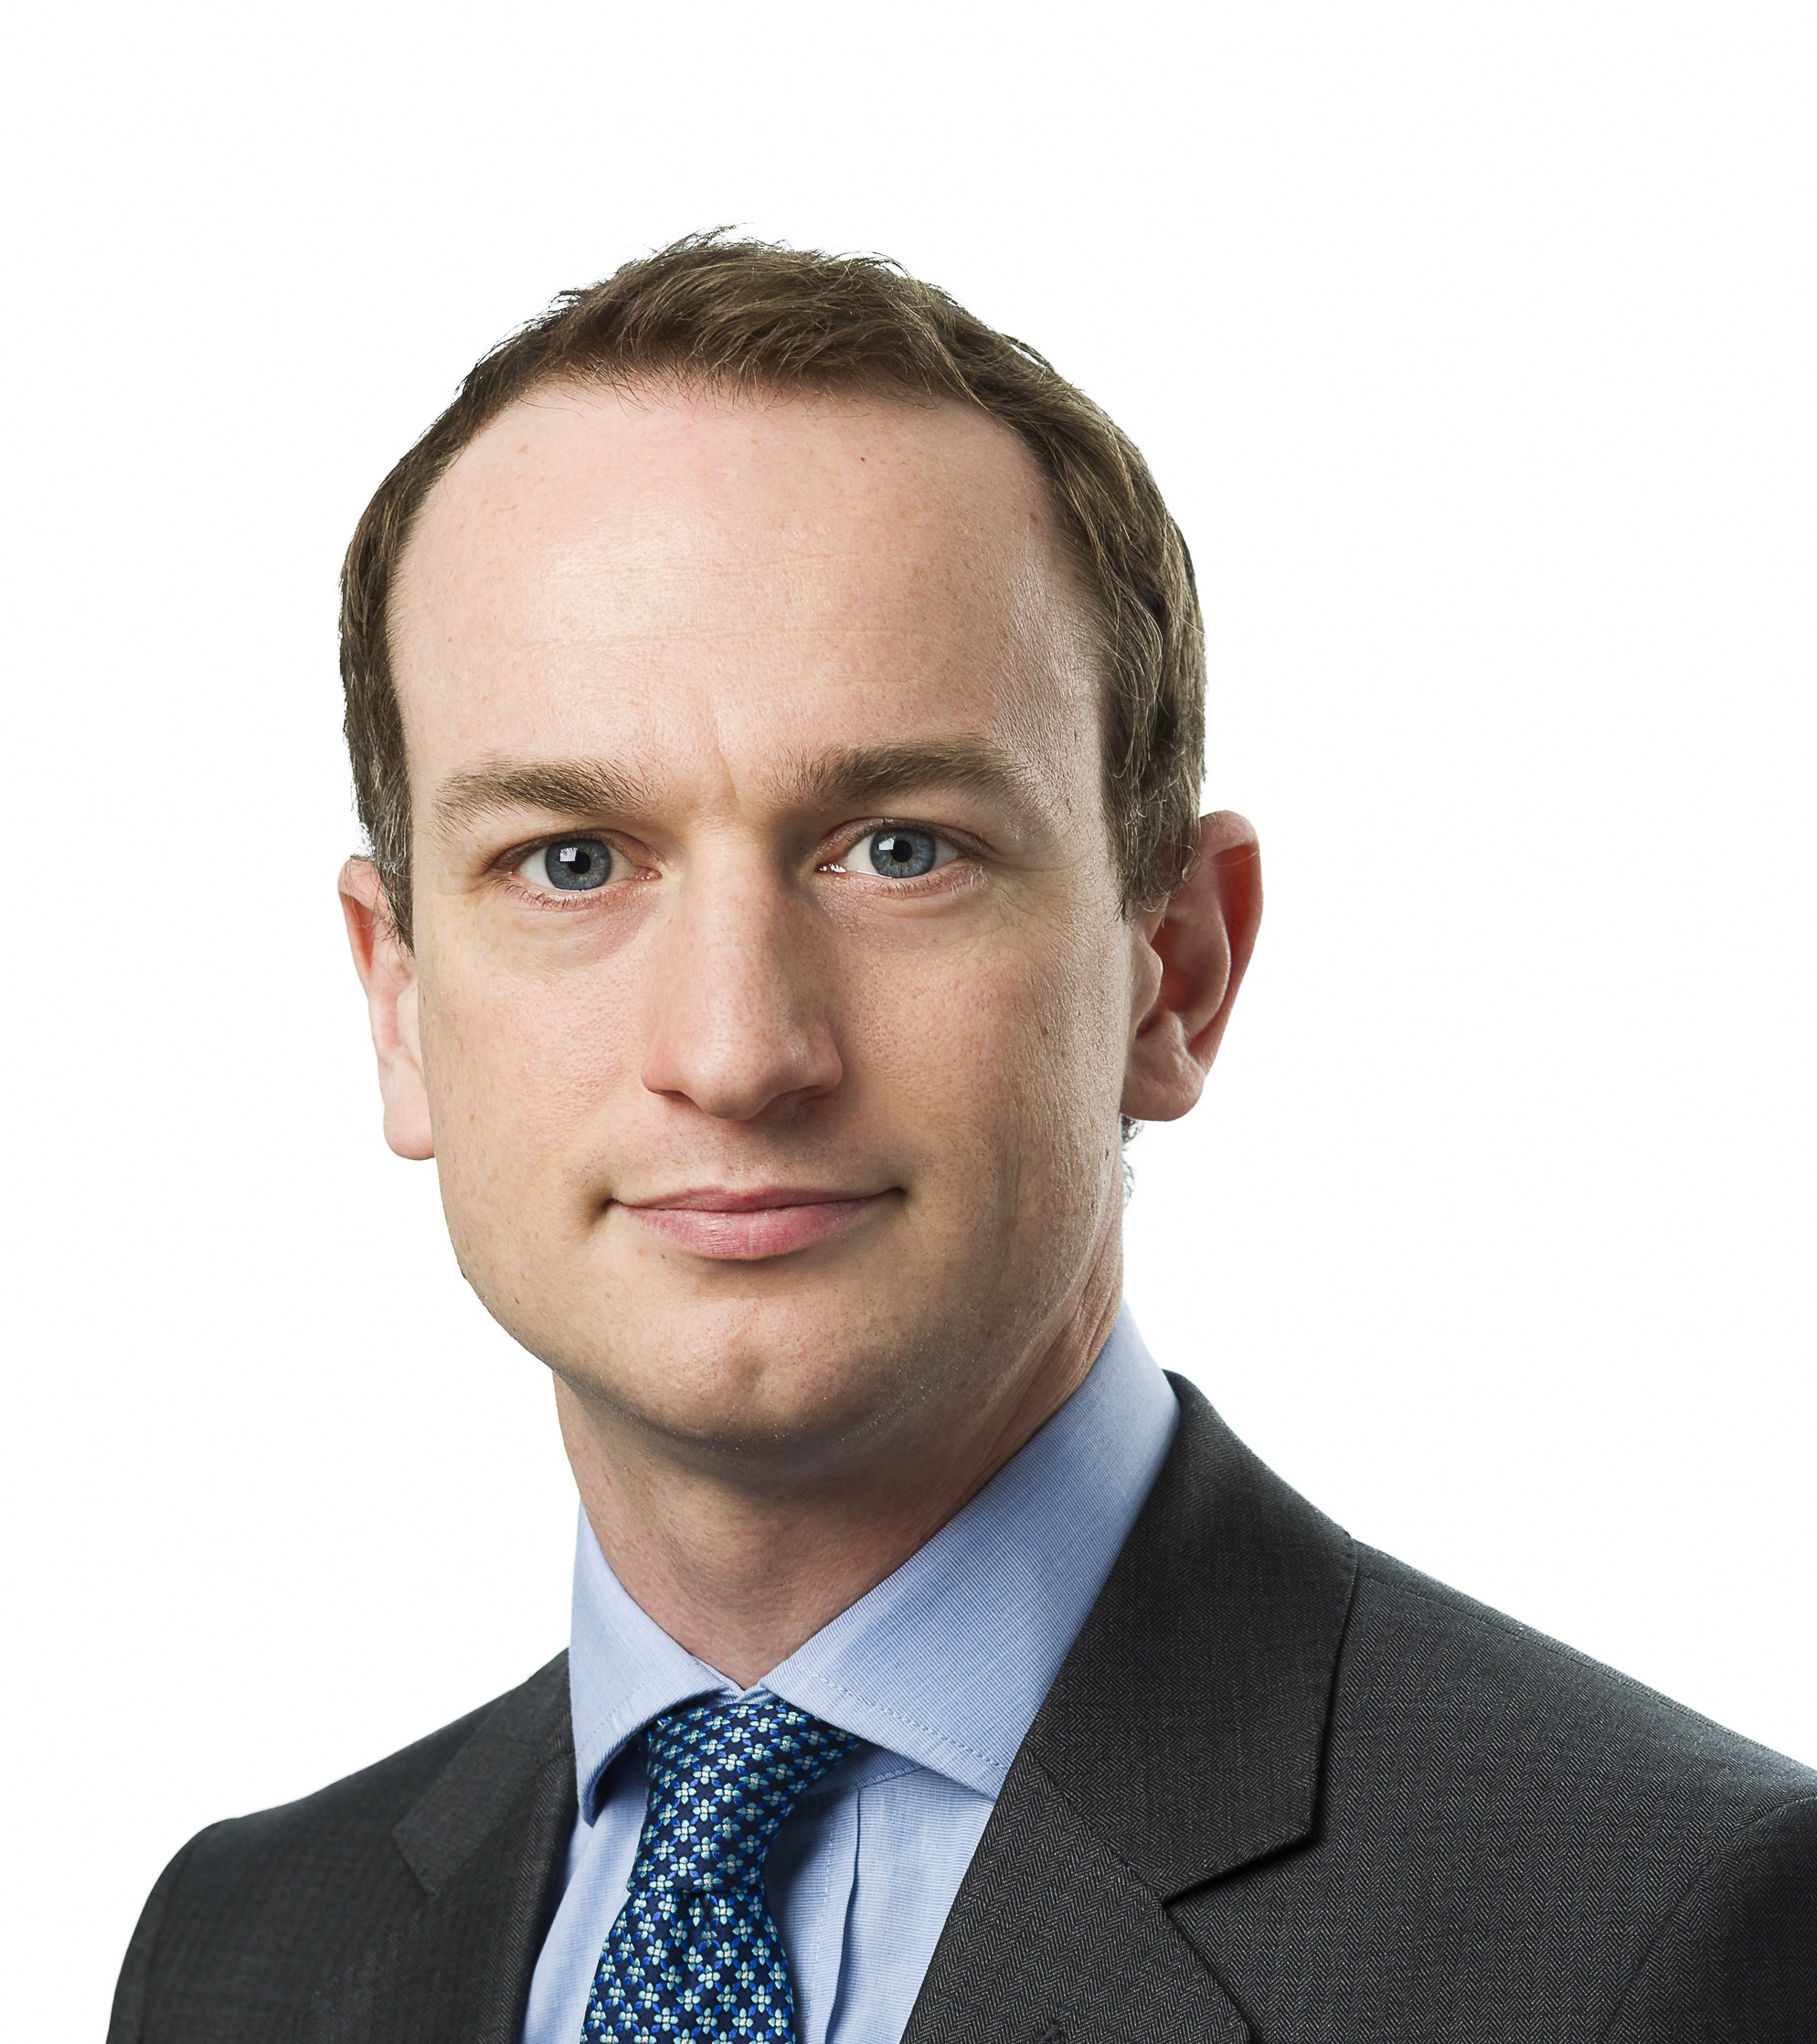 Matt Hindle, head of gas at the ENA